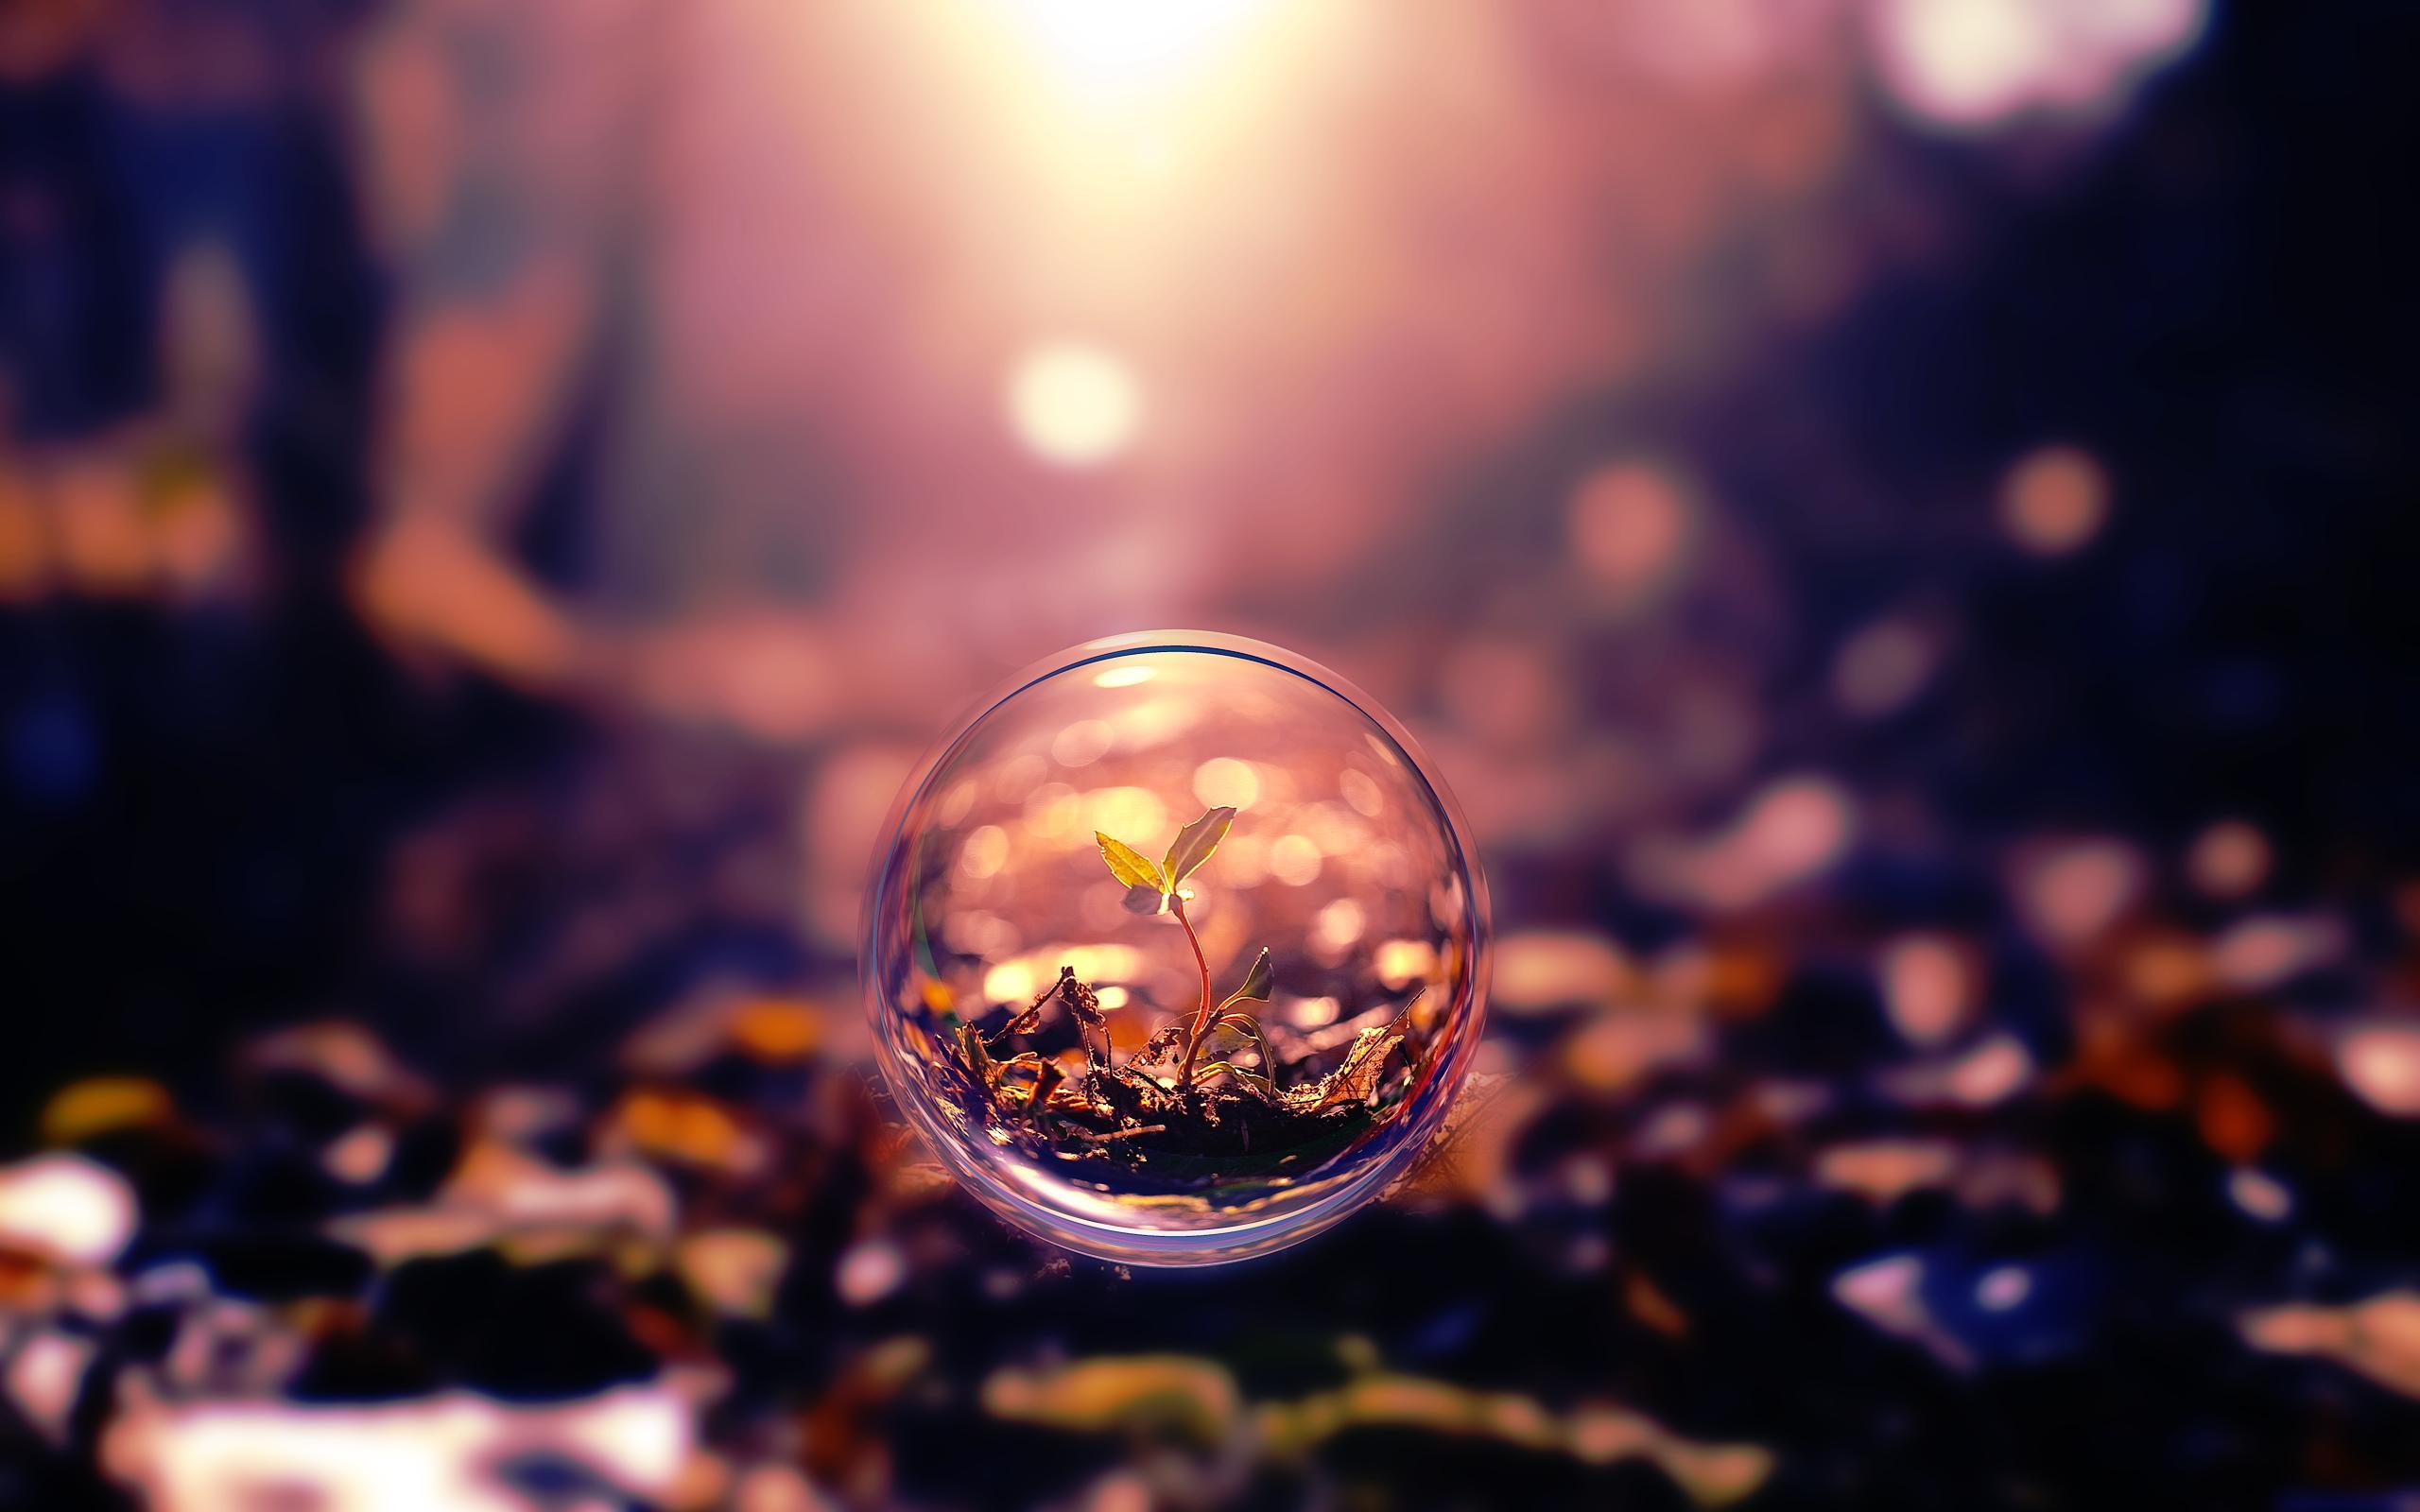 Plant in bubble